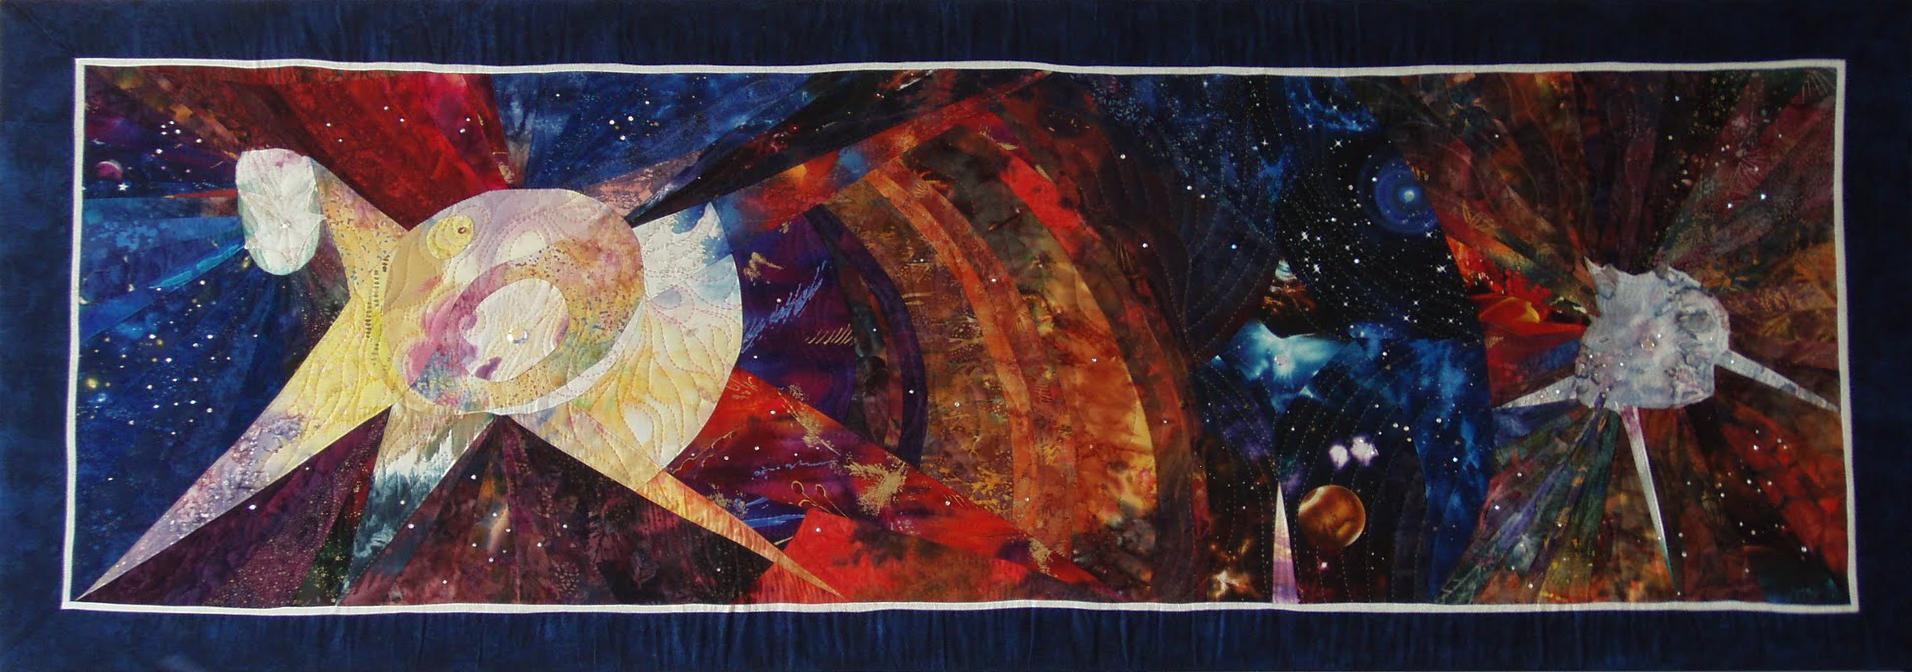 Supernova Quilt